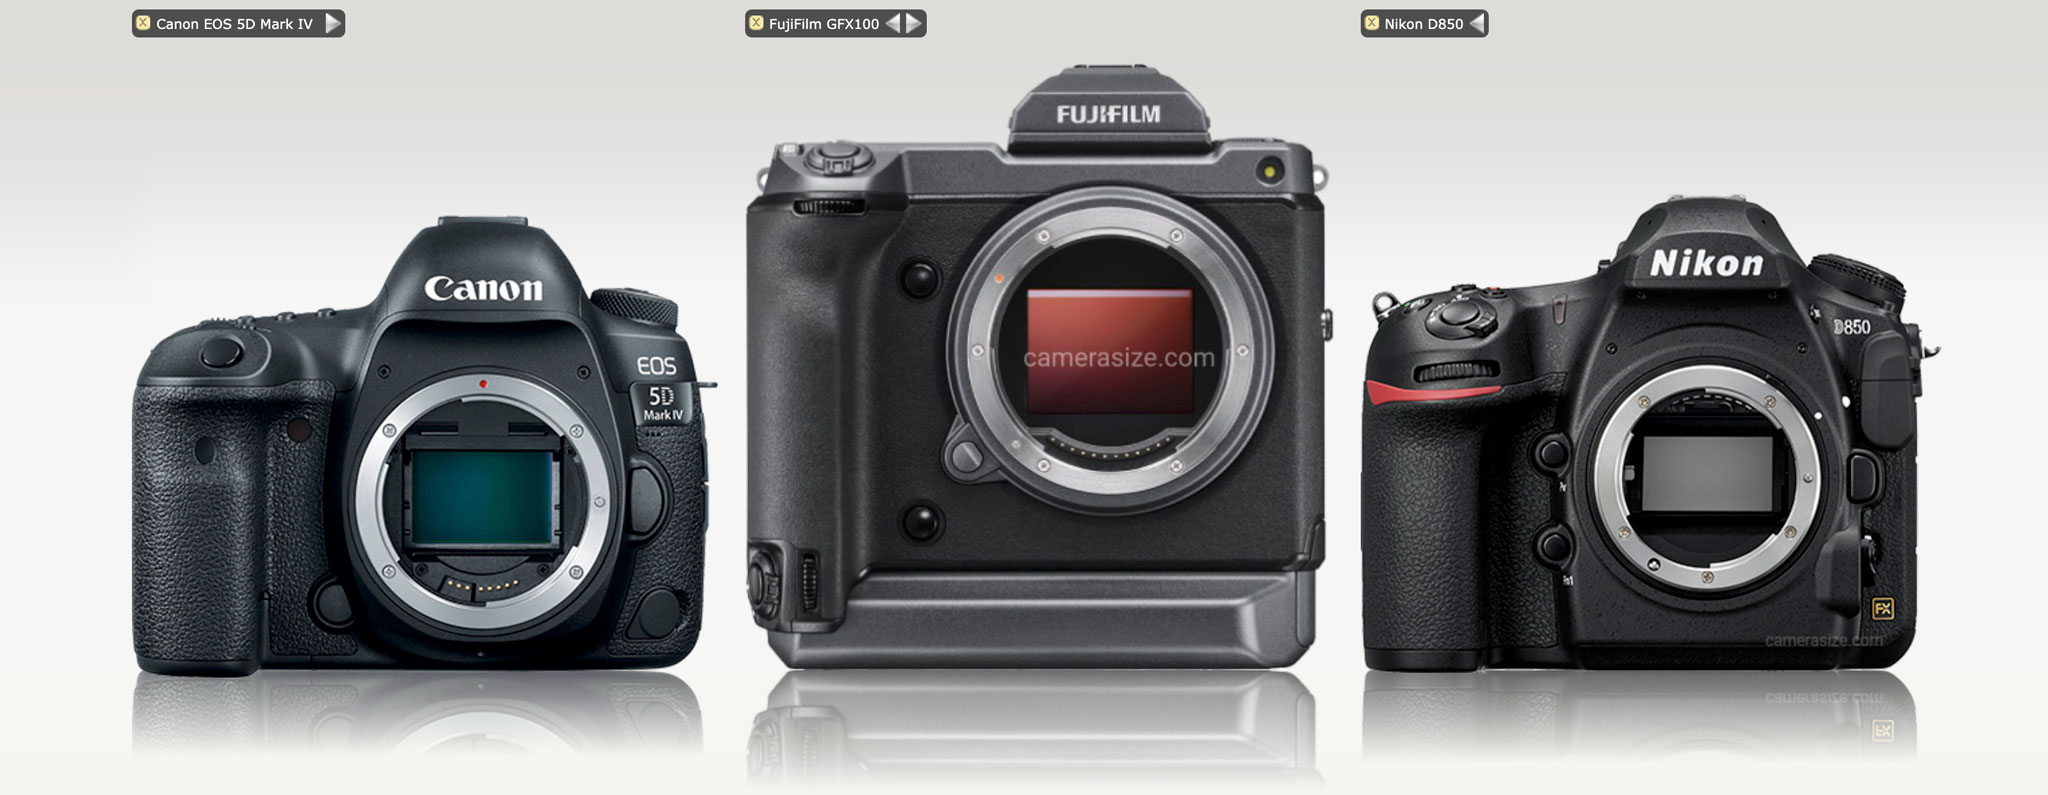 5DM4-GFX100-D850-truoc.jpg